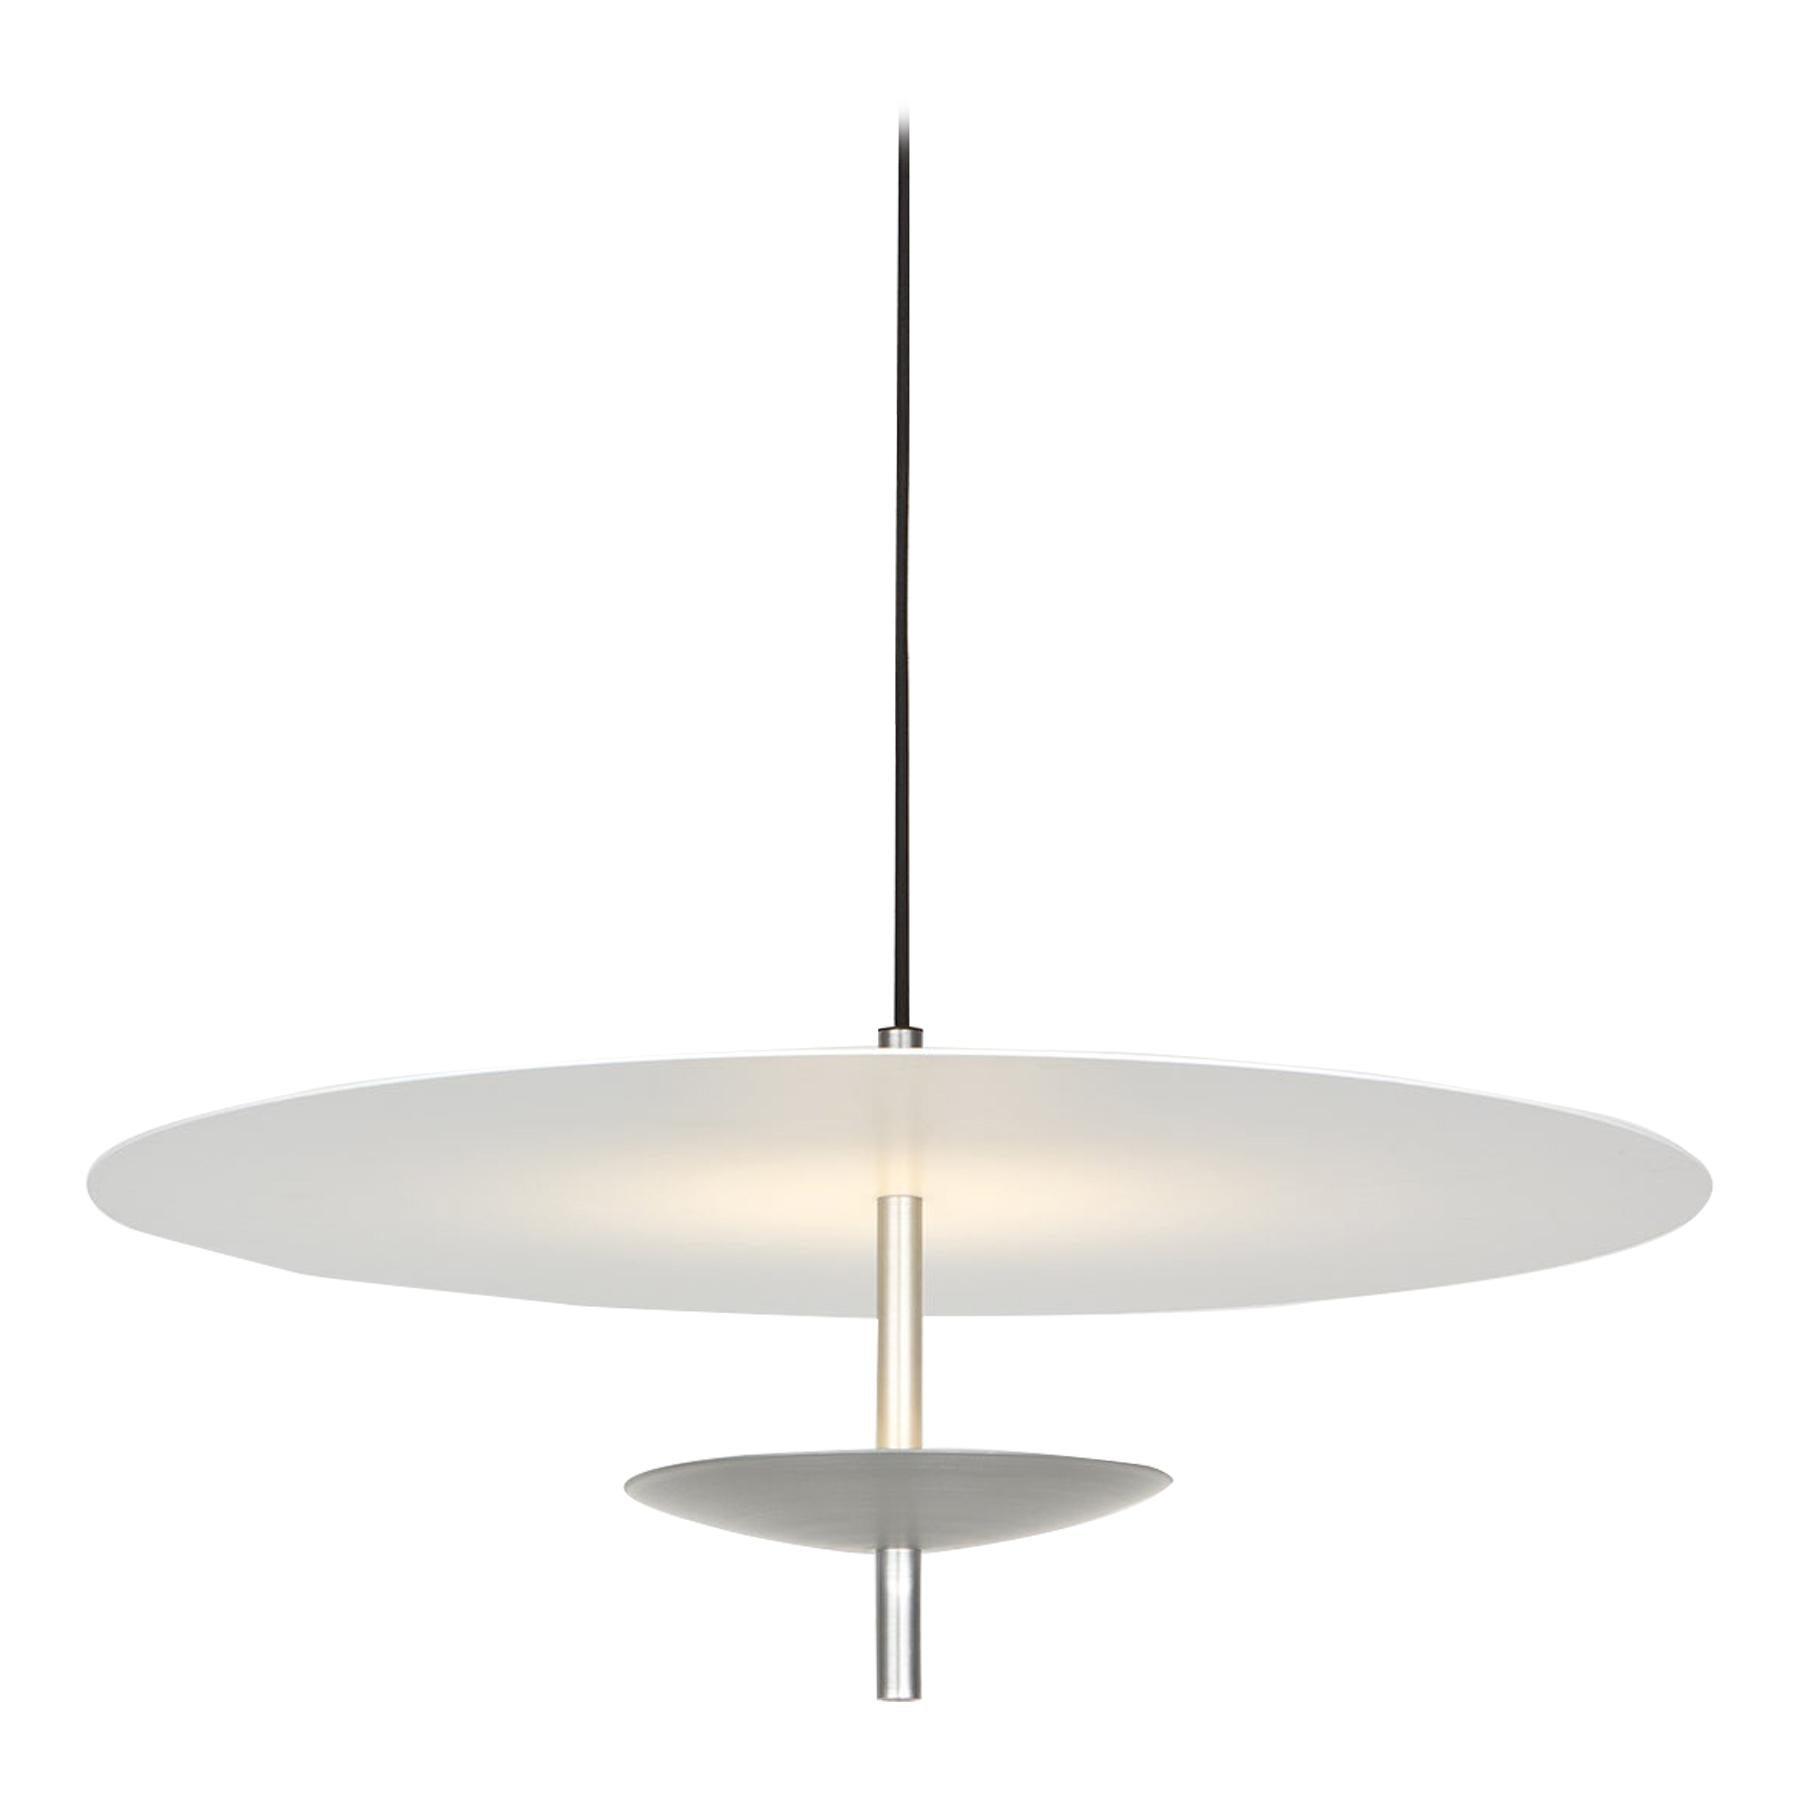 Reflector LED Pendant Light, Anodised Aluminum, Silver, White Shade